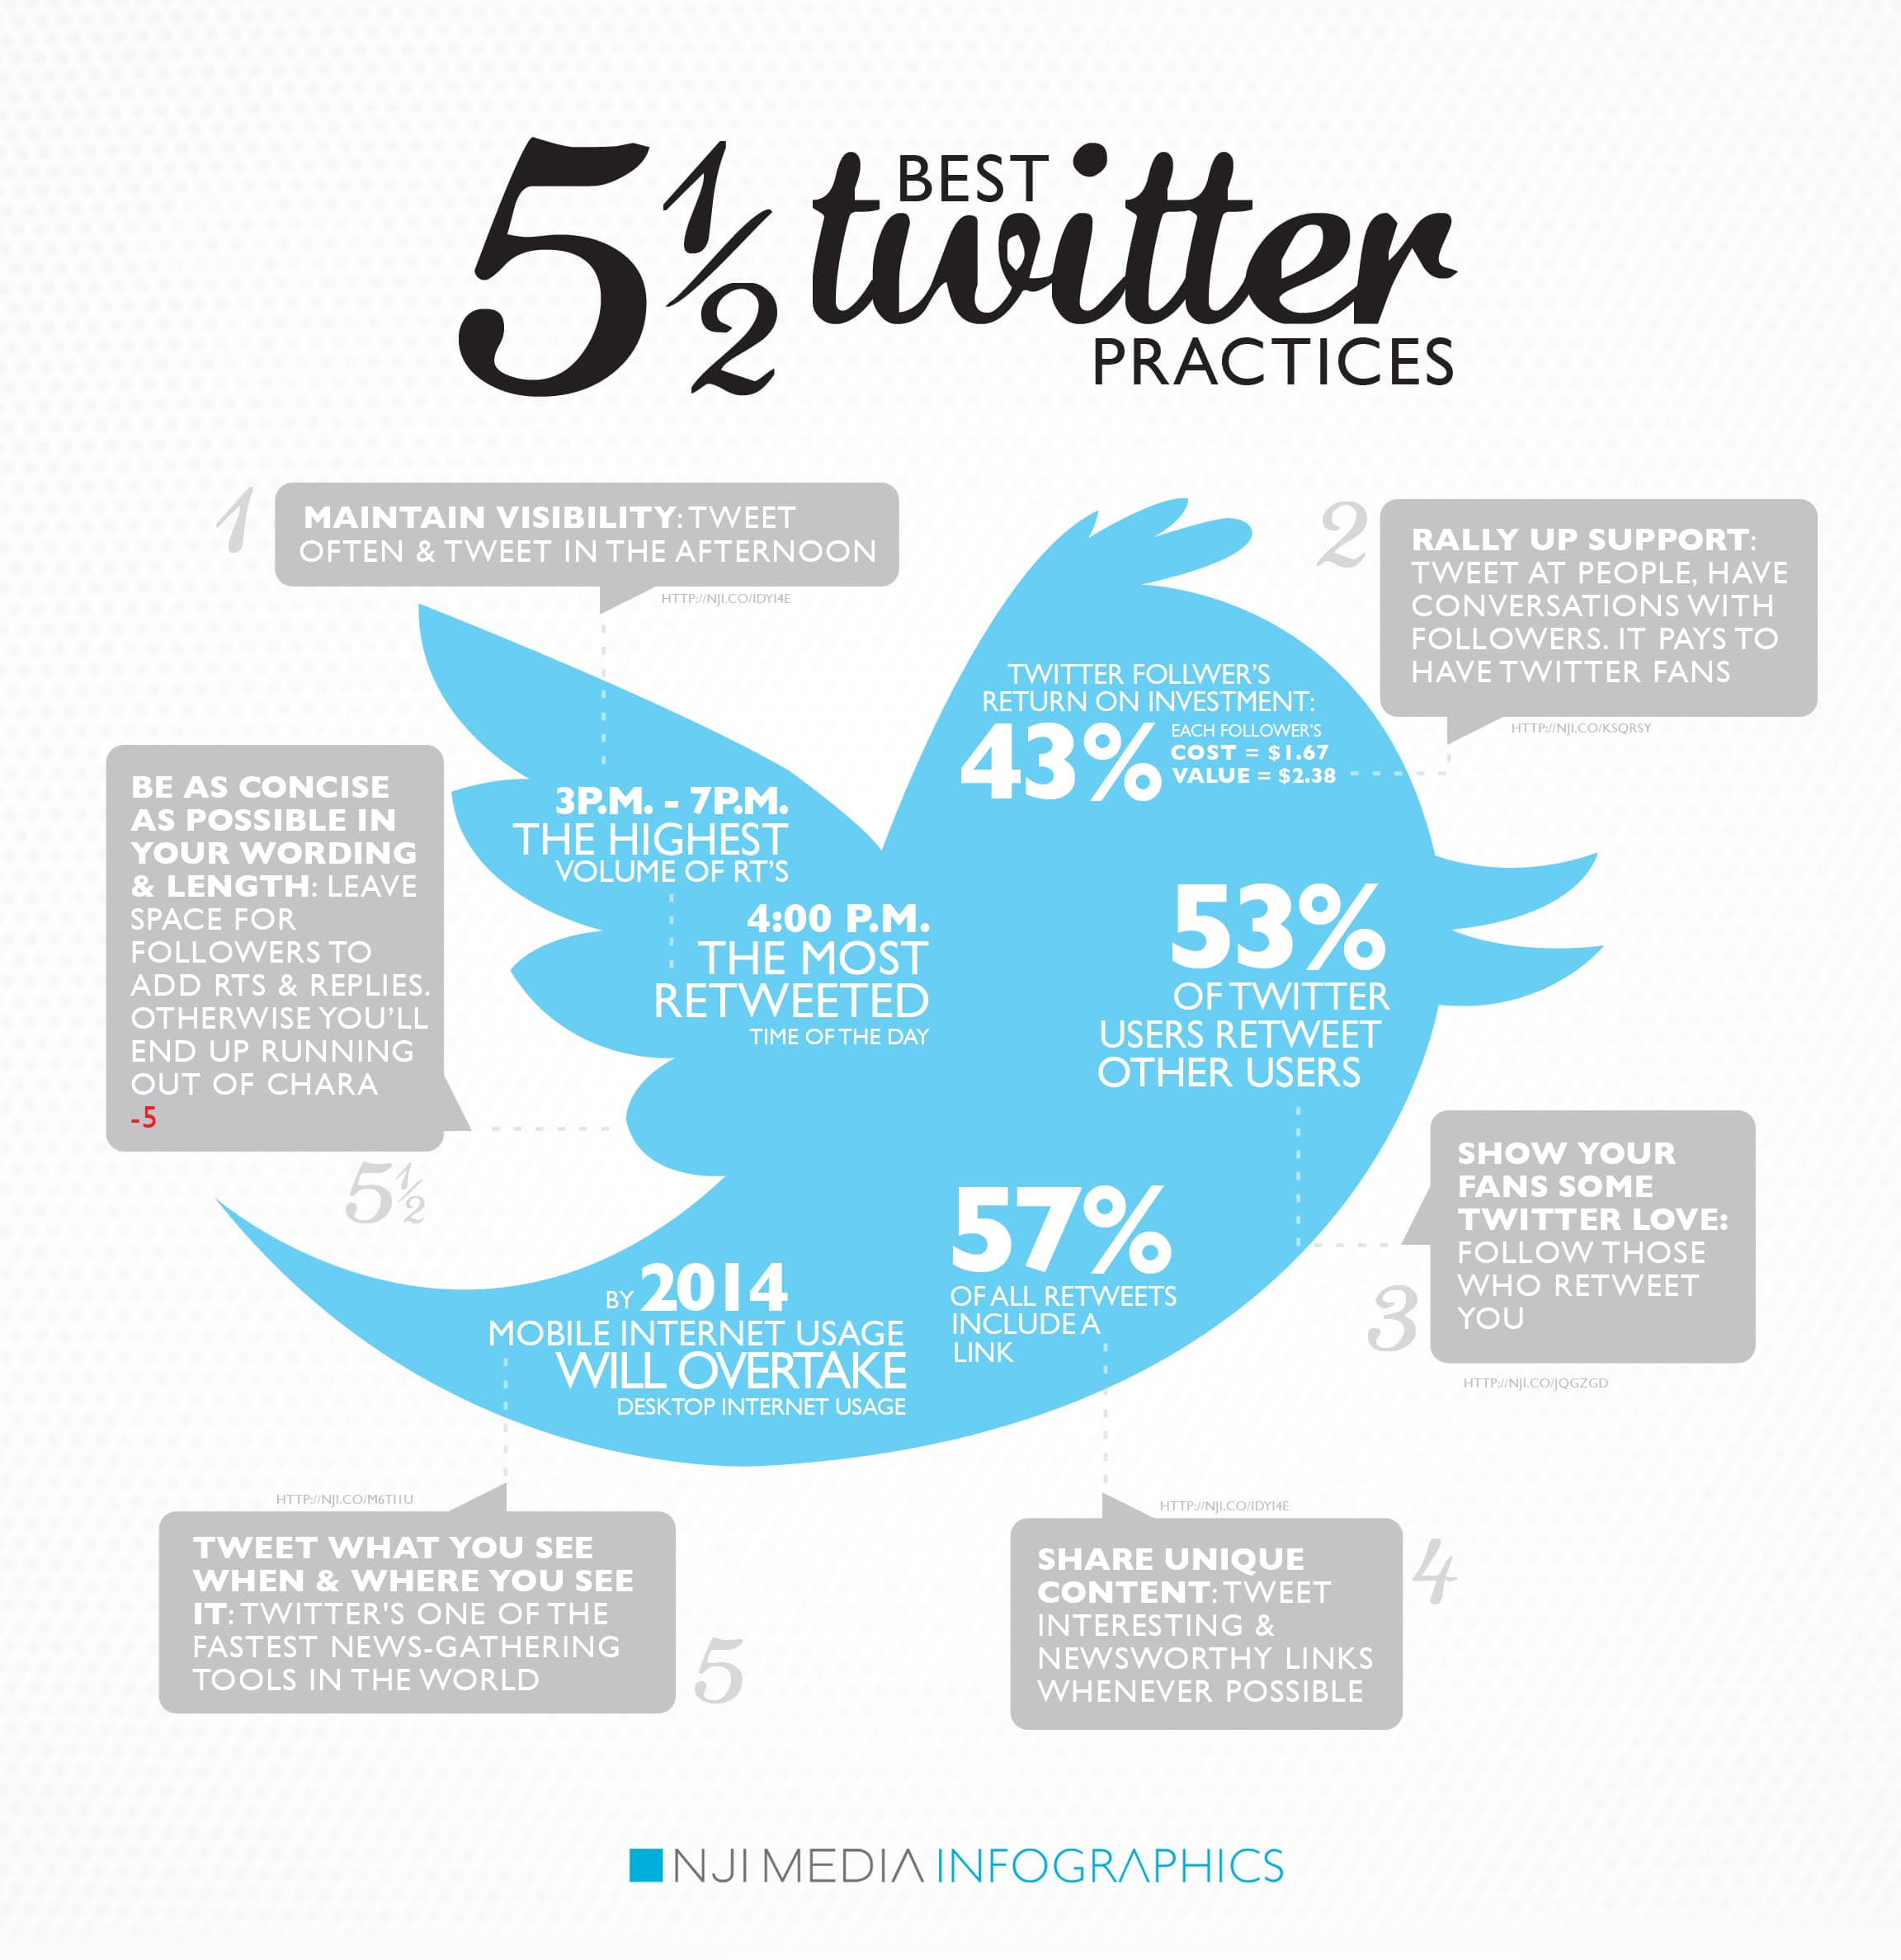 2012-best-twitter-practices-infographic